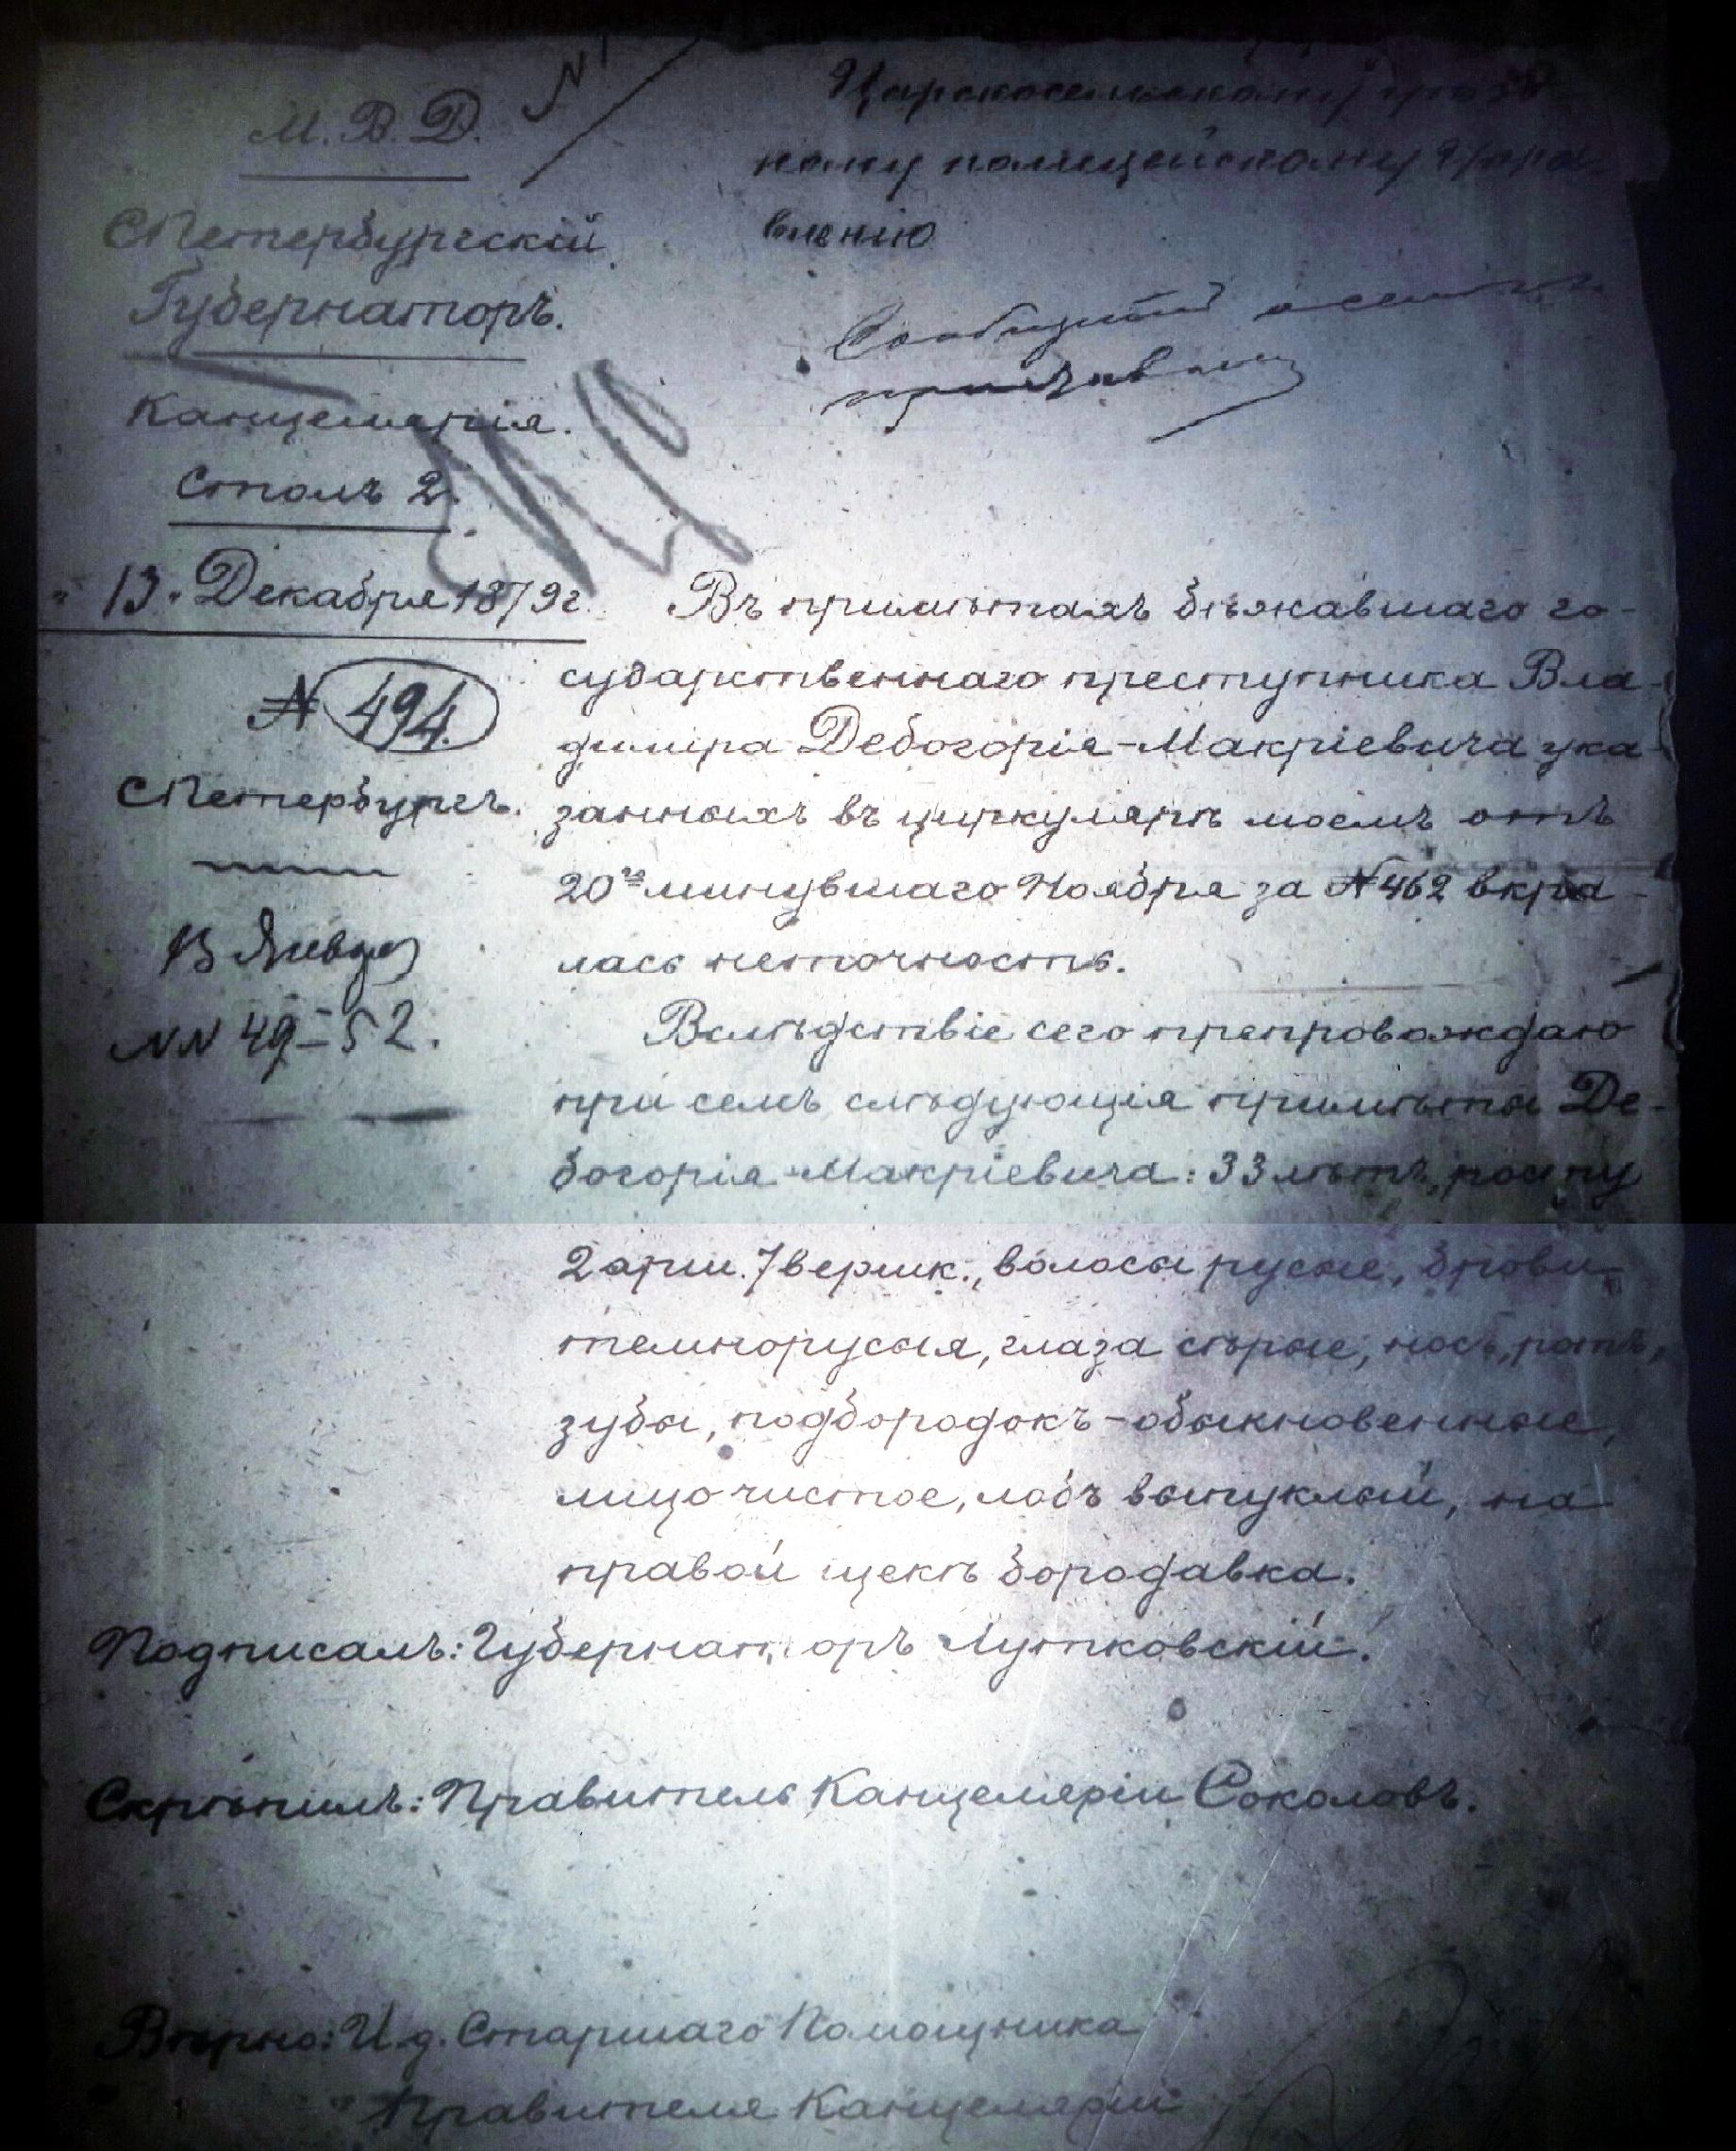 http://images.vfl.ru/ii/1552845861/bdcfca7b/25805614.jpg